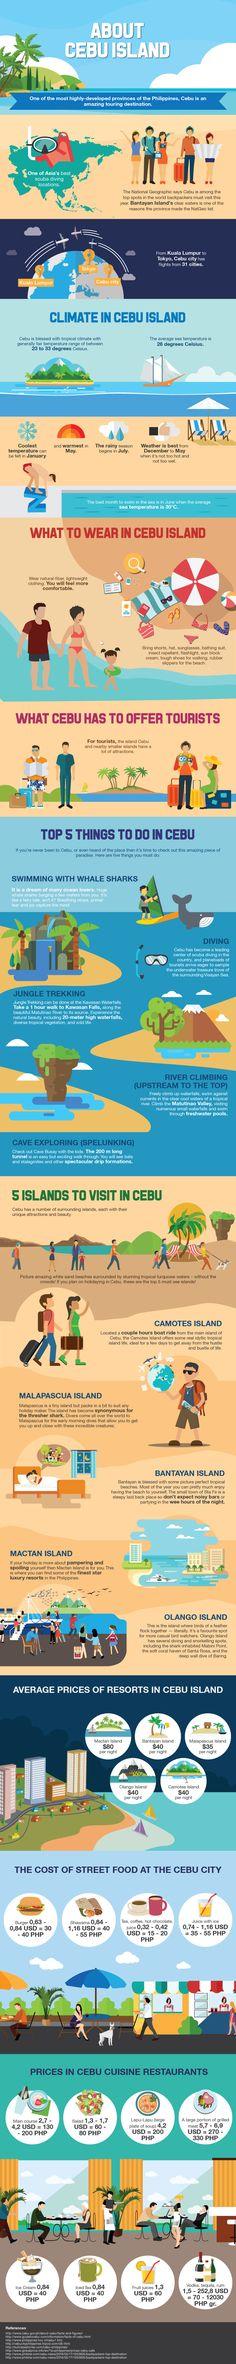 Reasons To Visit Cebu Island                                                                                                                                                      More